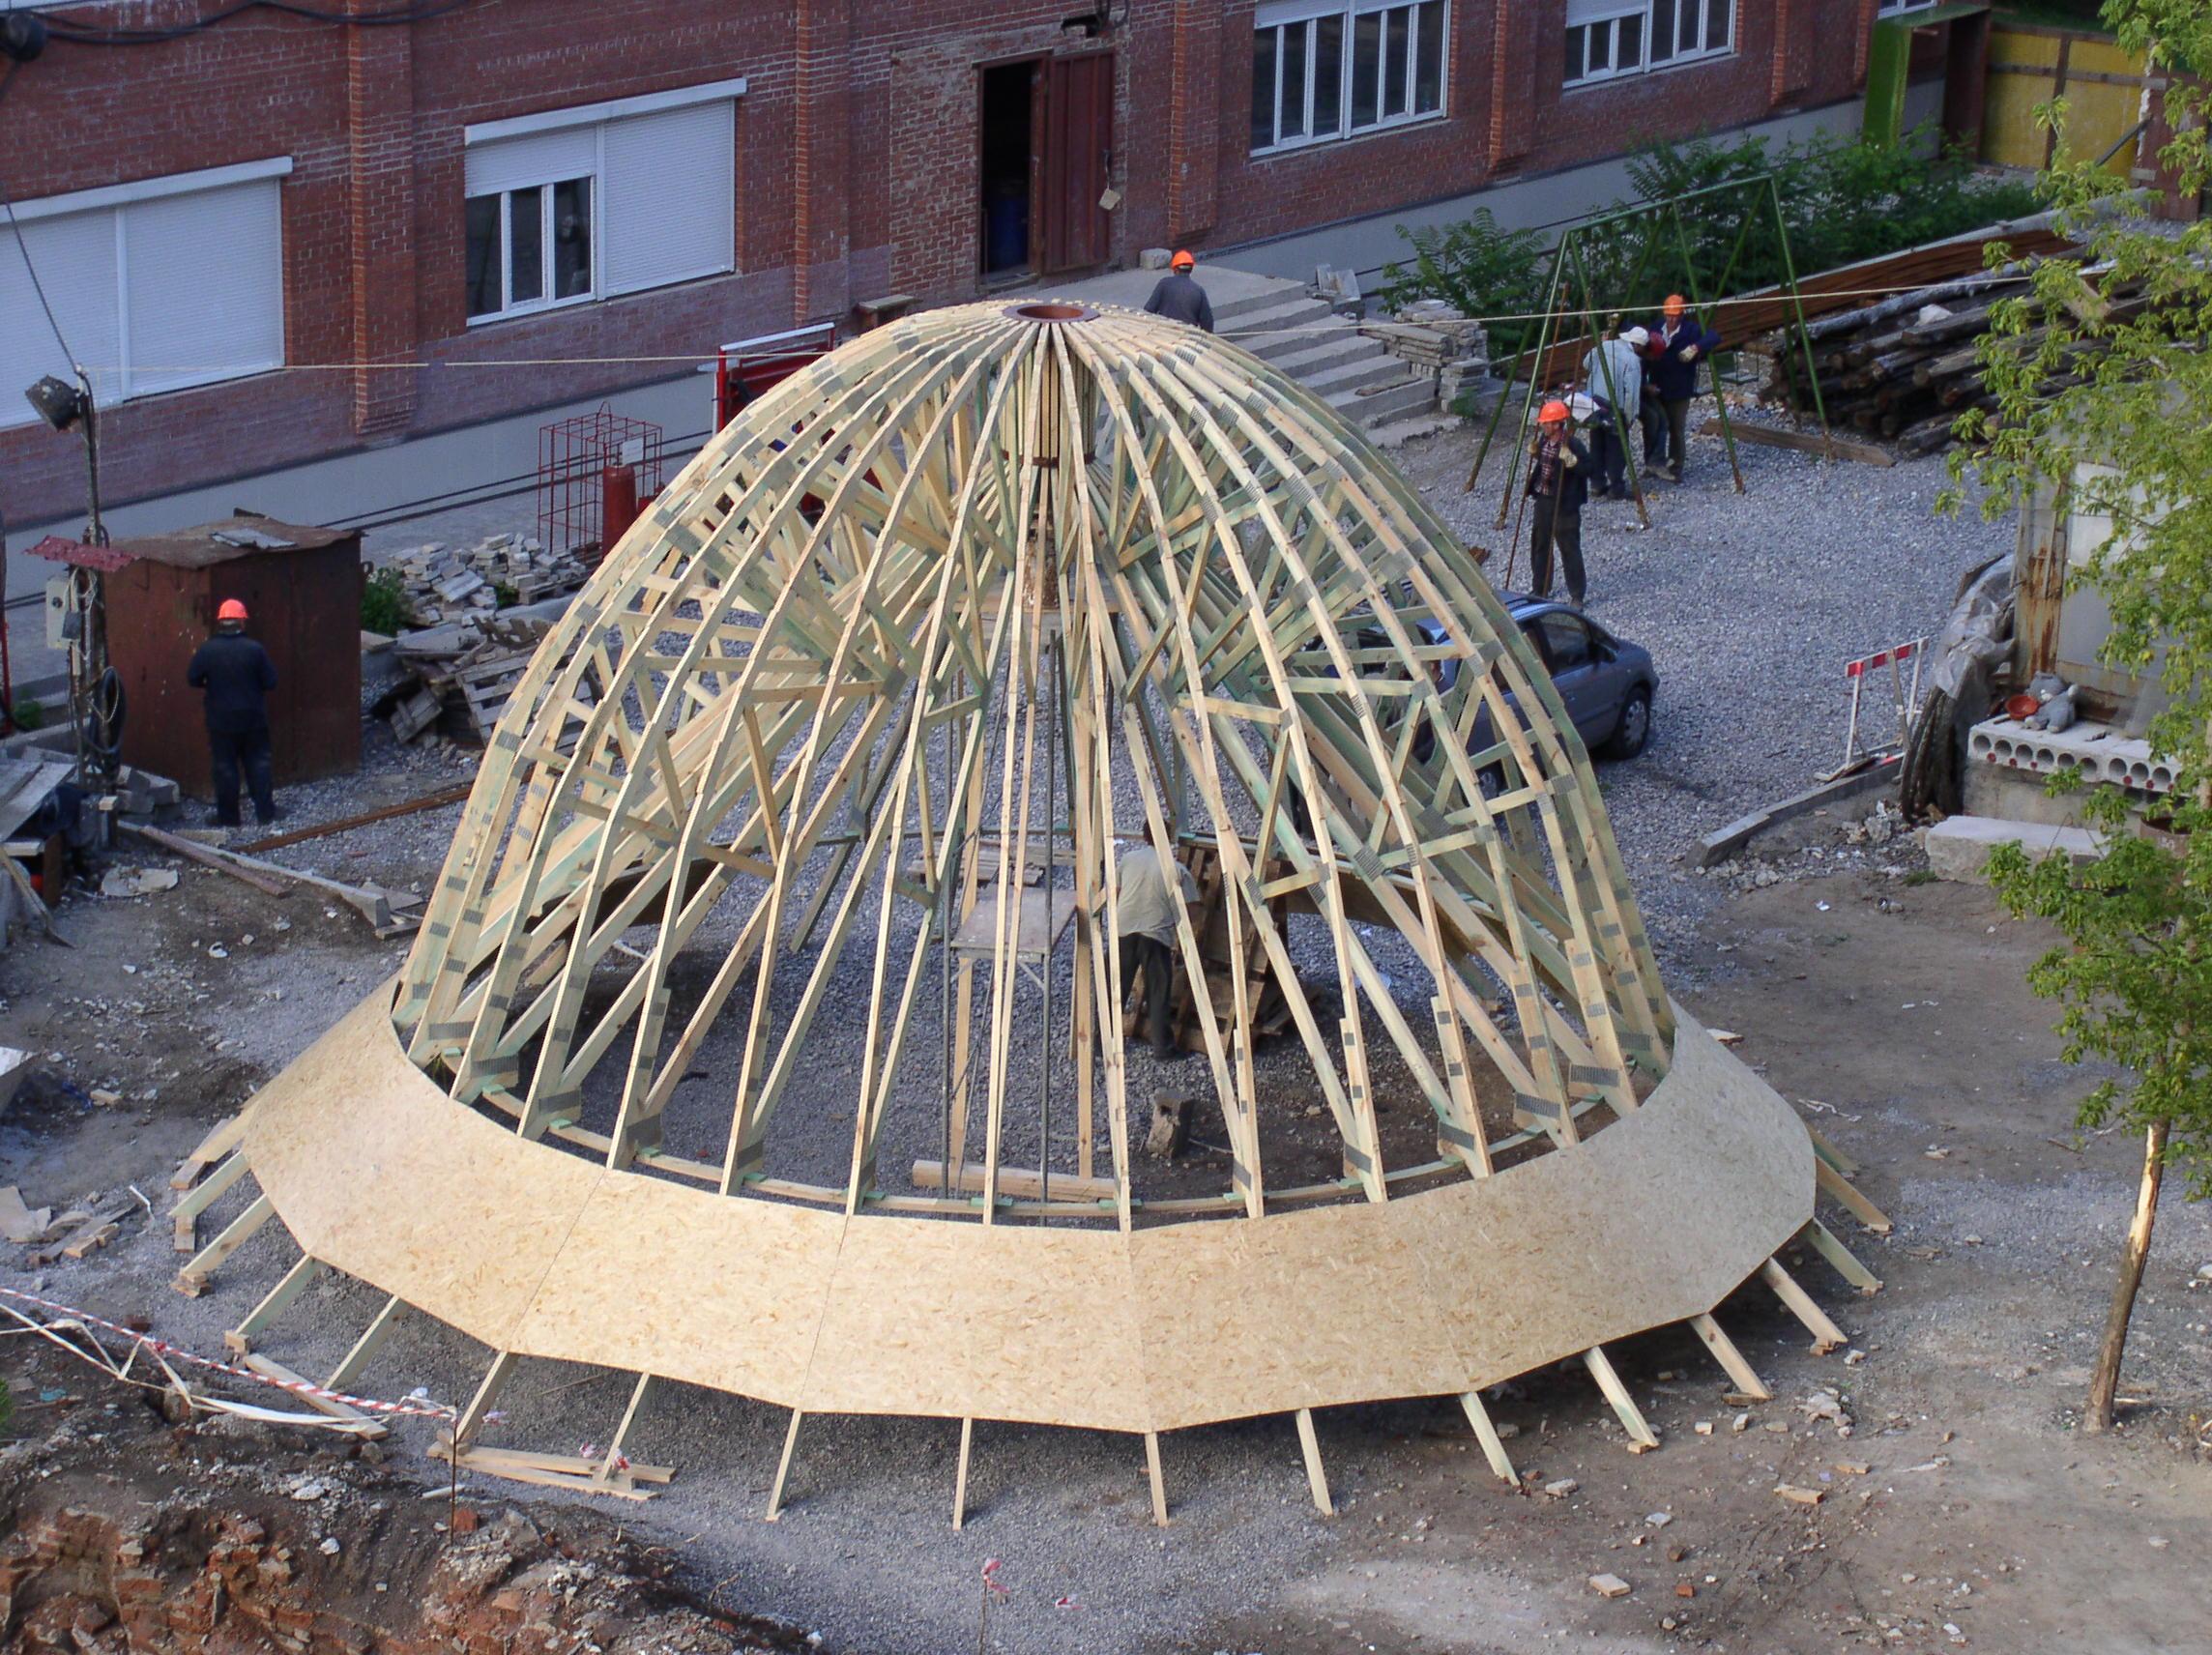 krovy-strechy-vaznik-nosnik-vyroba-priehradovych-bardejov-presov-kosice-krytina-projekt-navrh-ponuka-cena-2.jpg